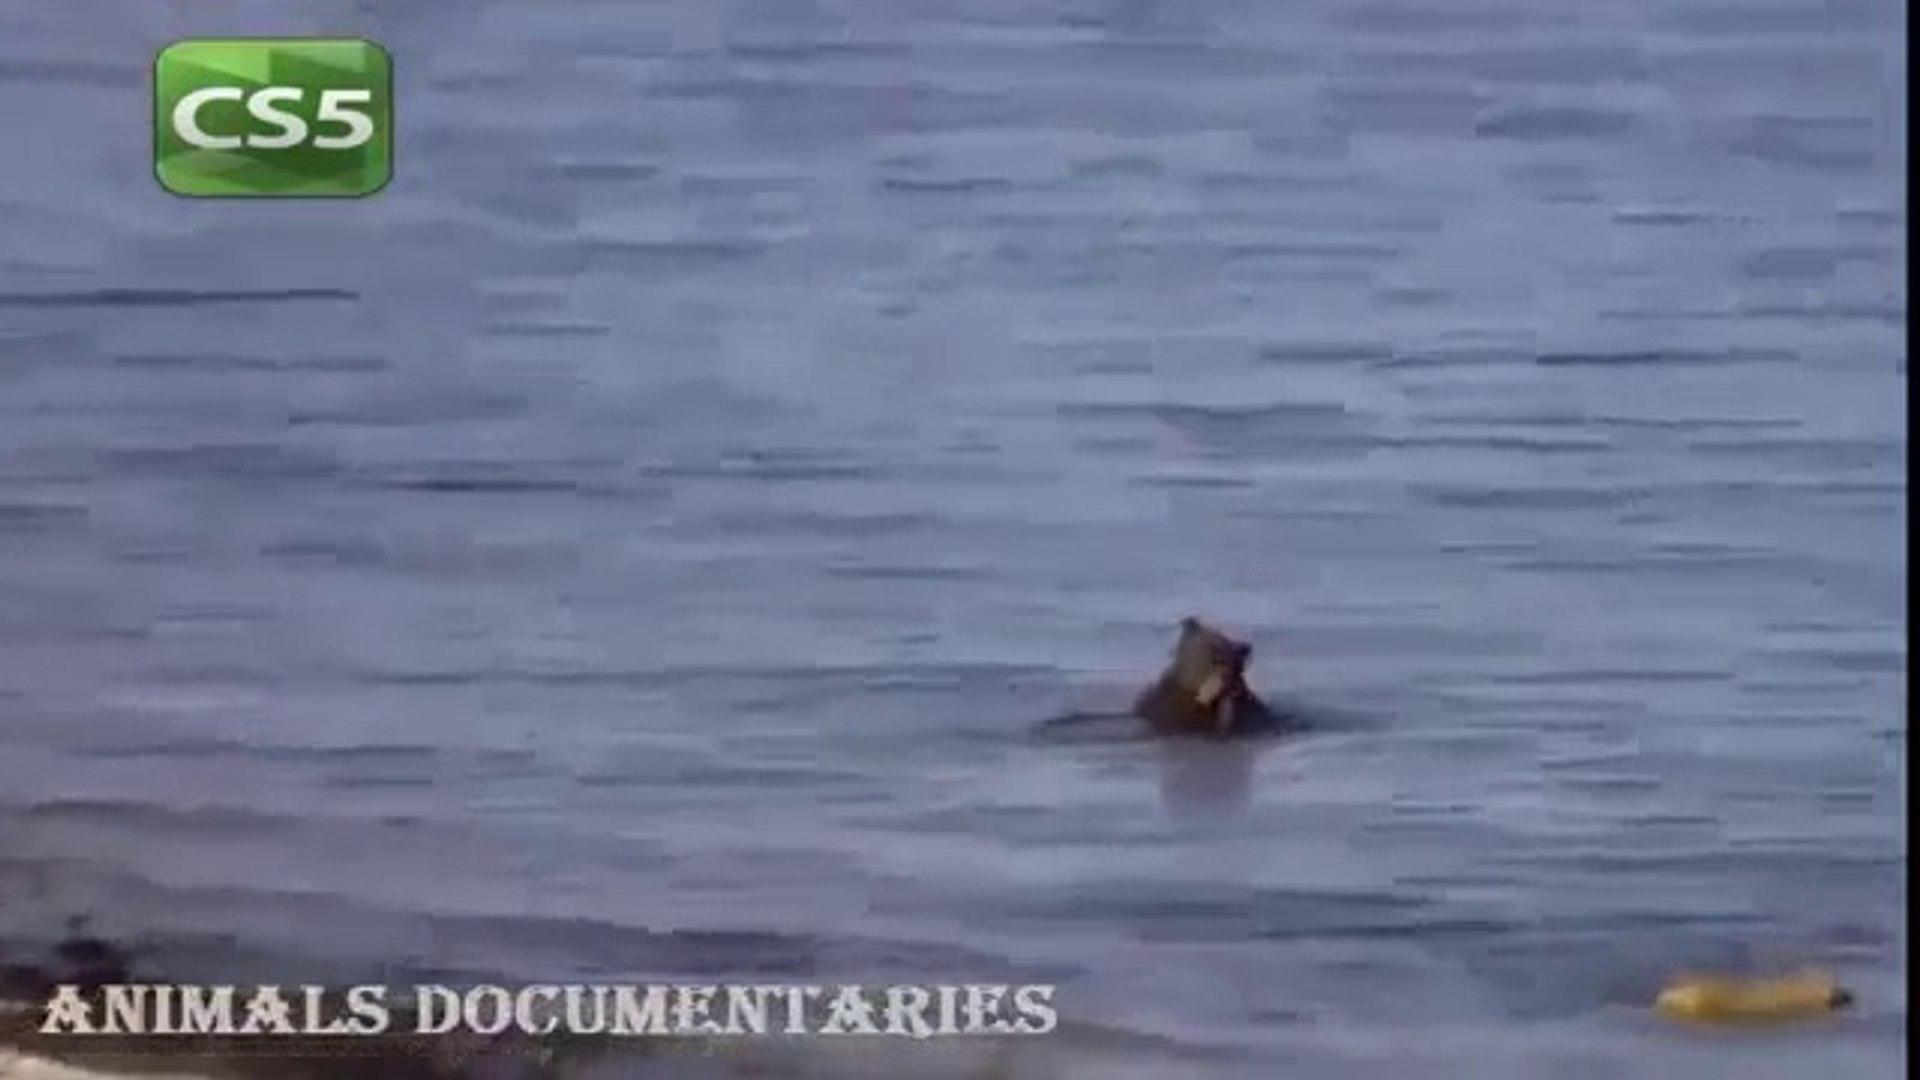 National Geographic Documentary Animals 2015_Wildlife Lions Animals